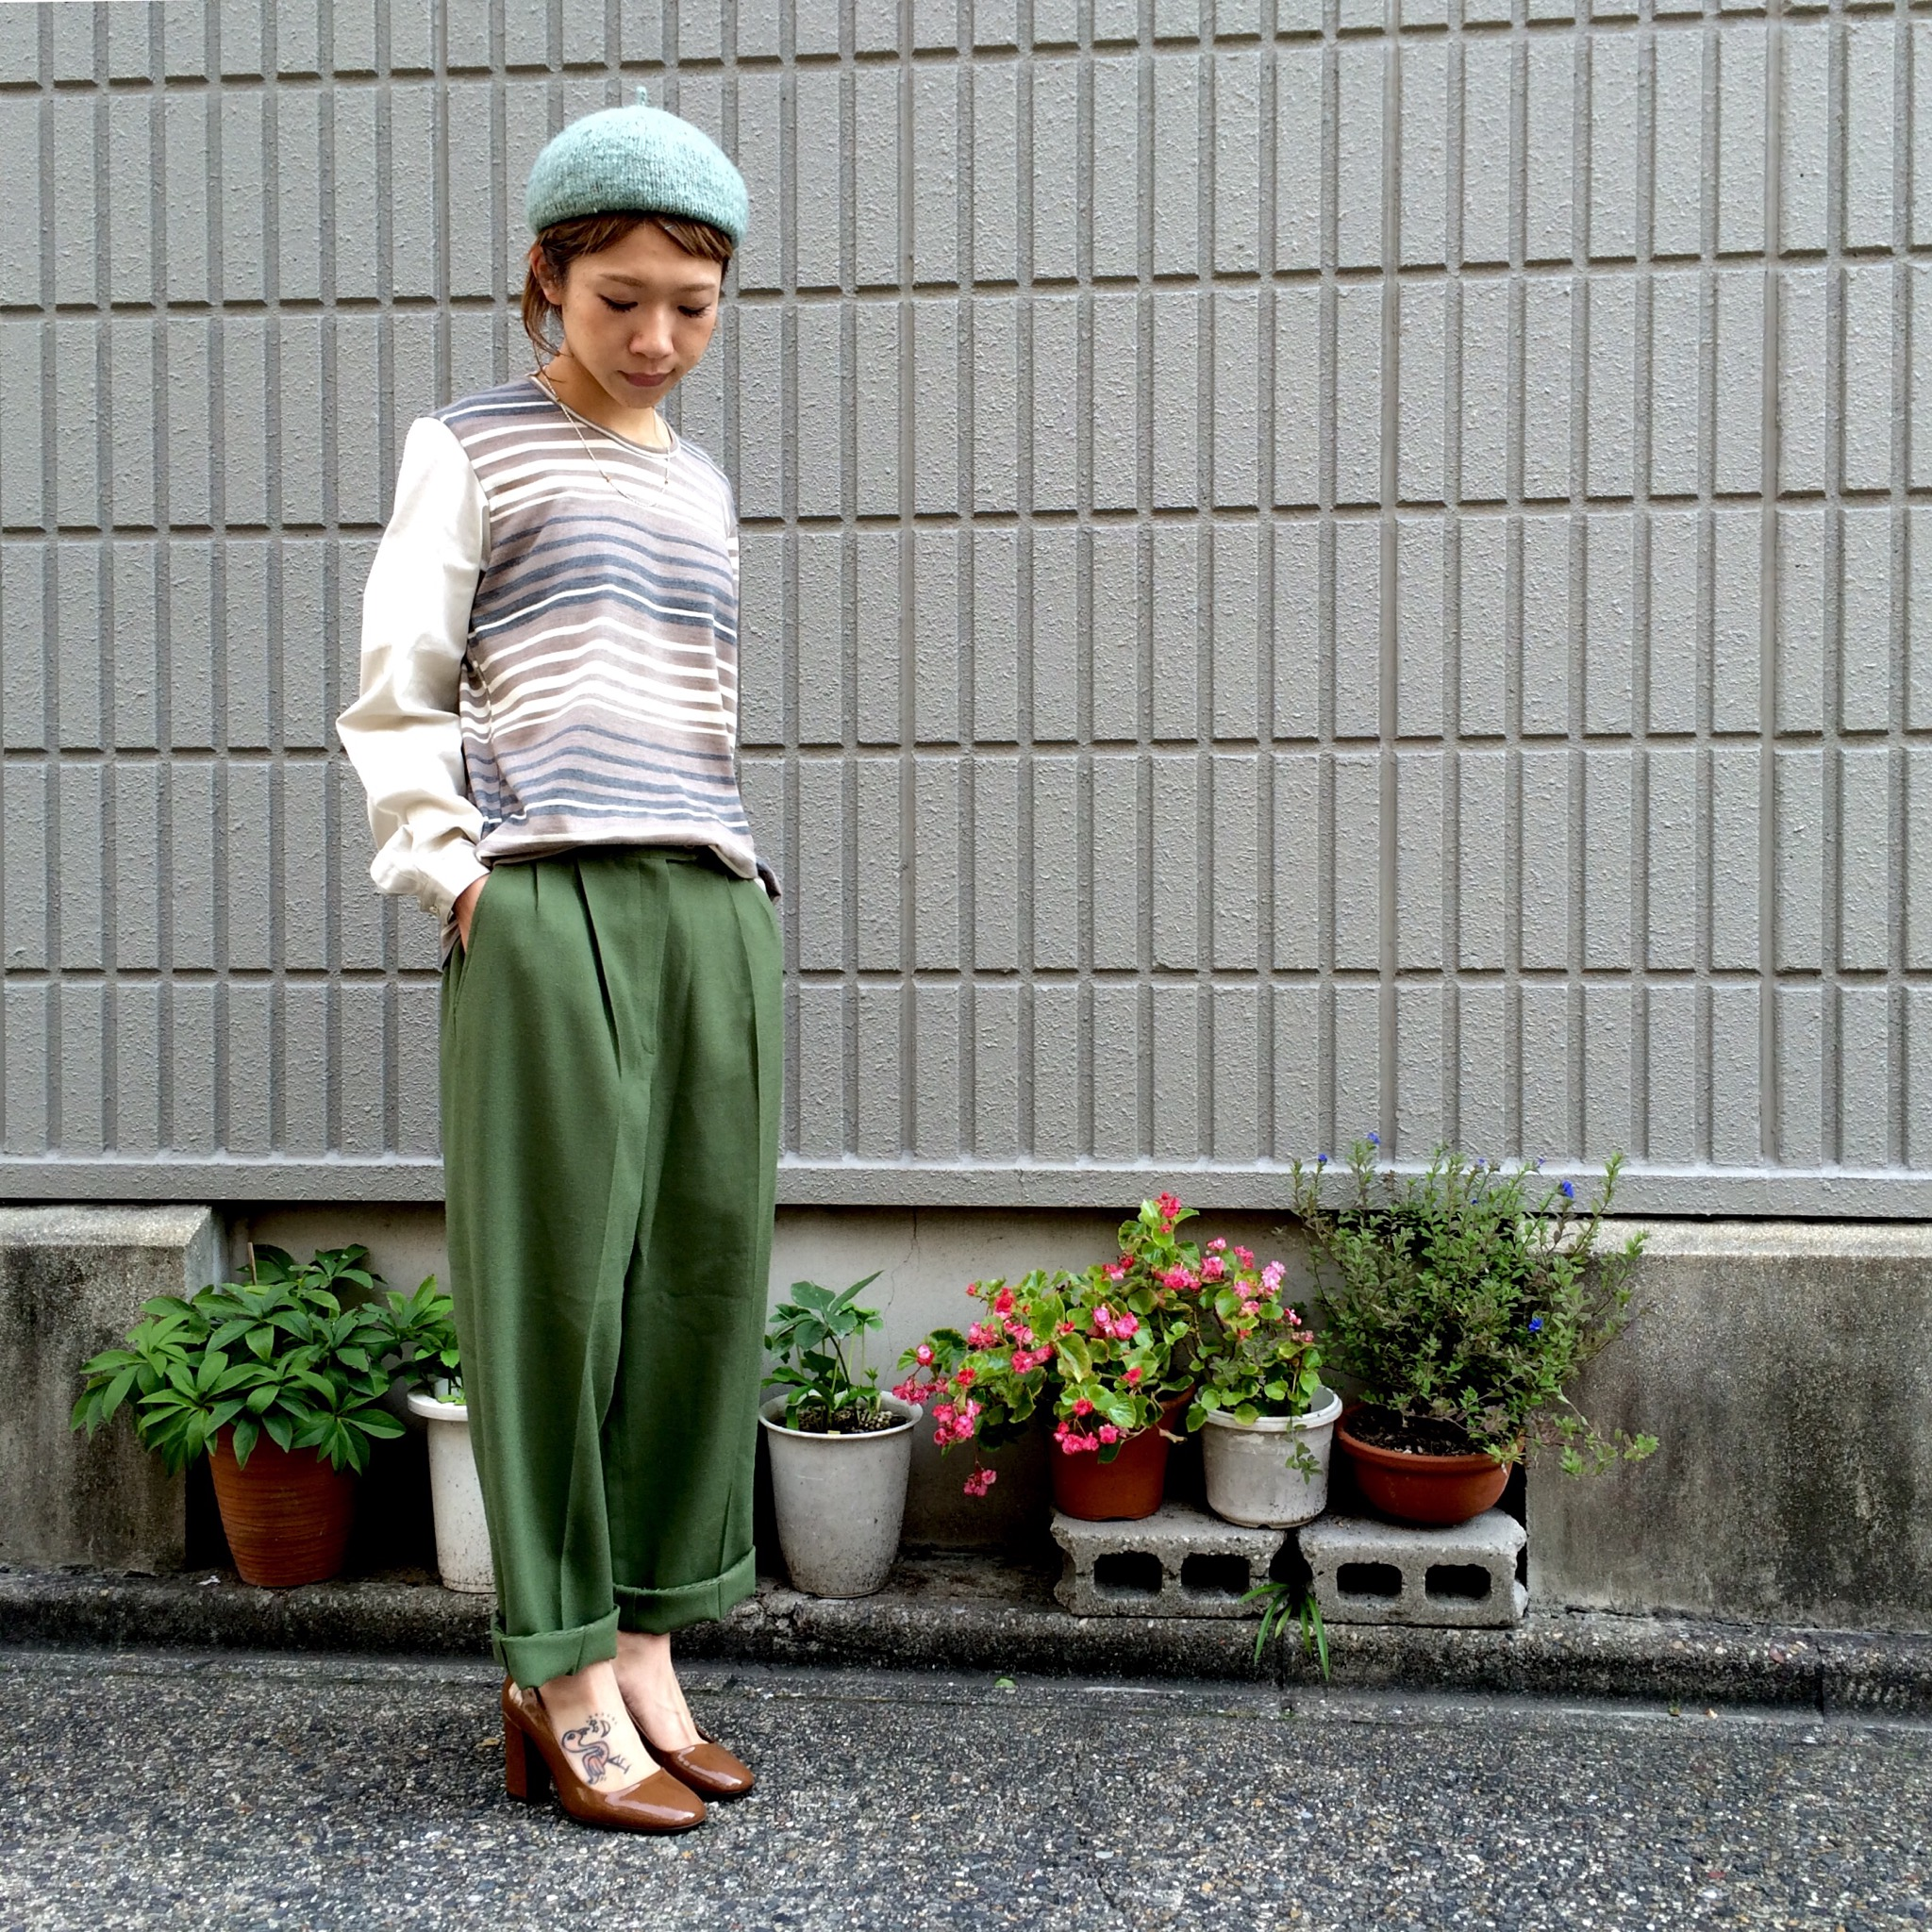 IMG_6184-0.JPG